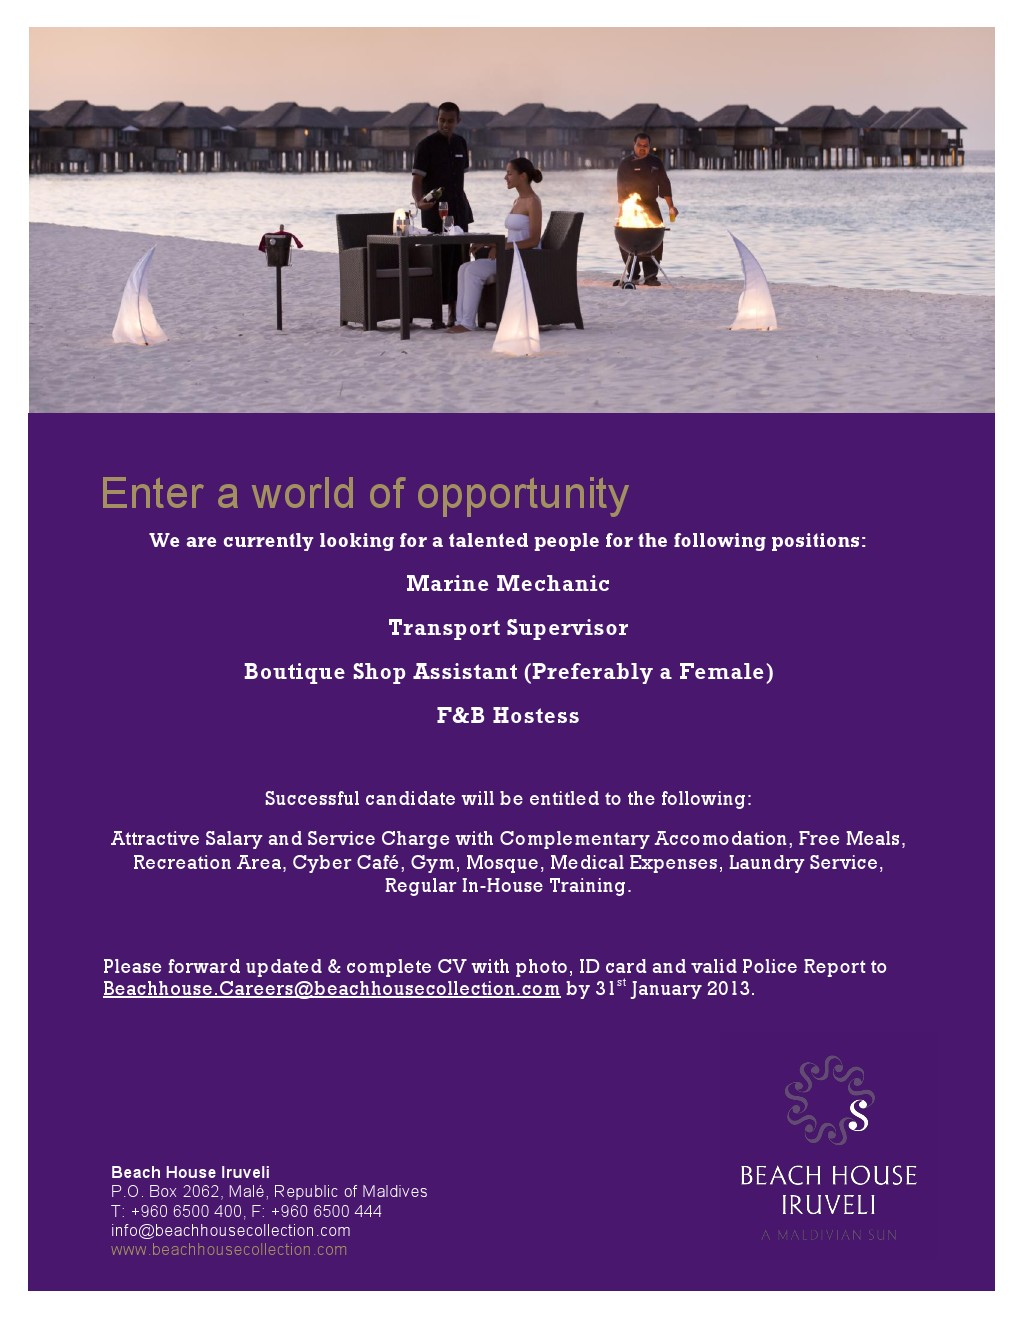 Job Maldives: Job Opportunities at Beach House Iruveli